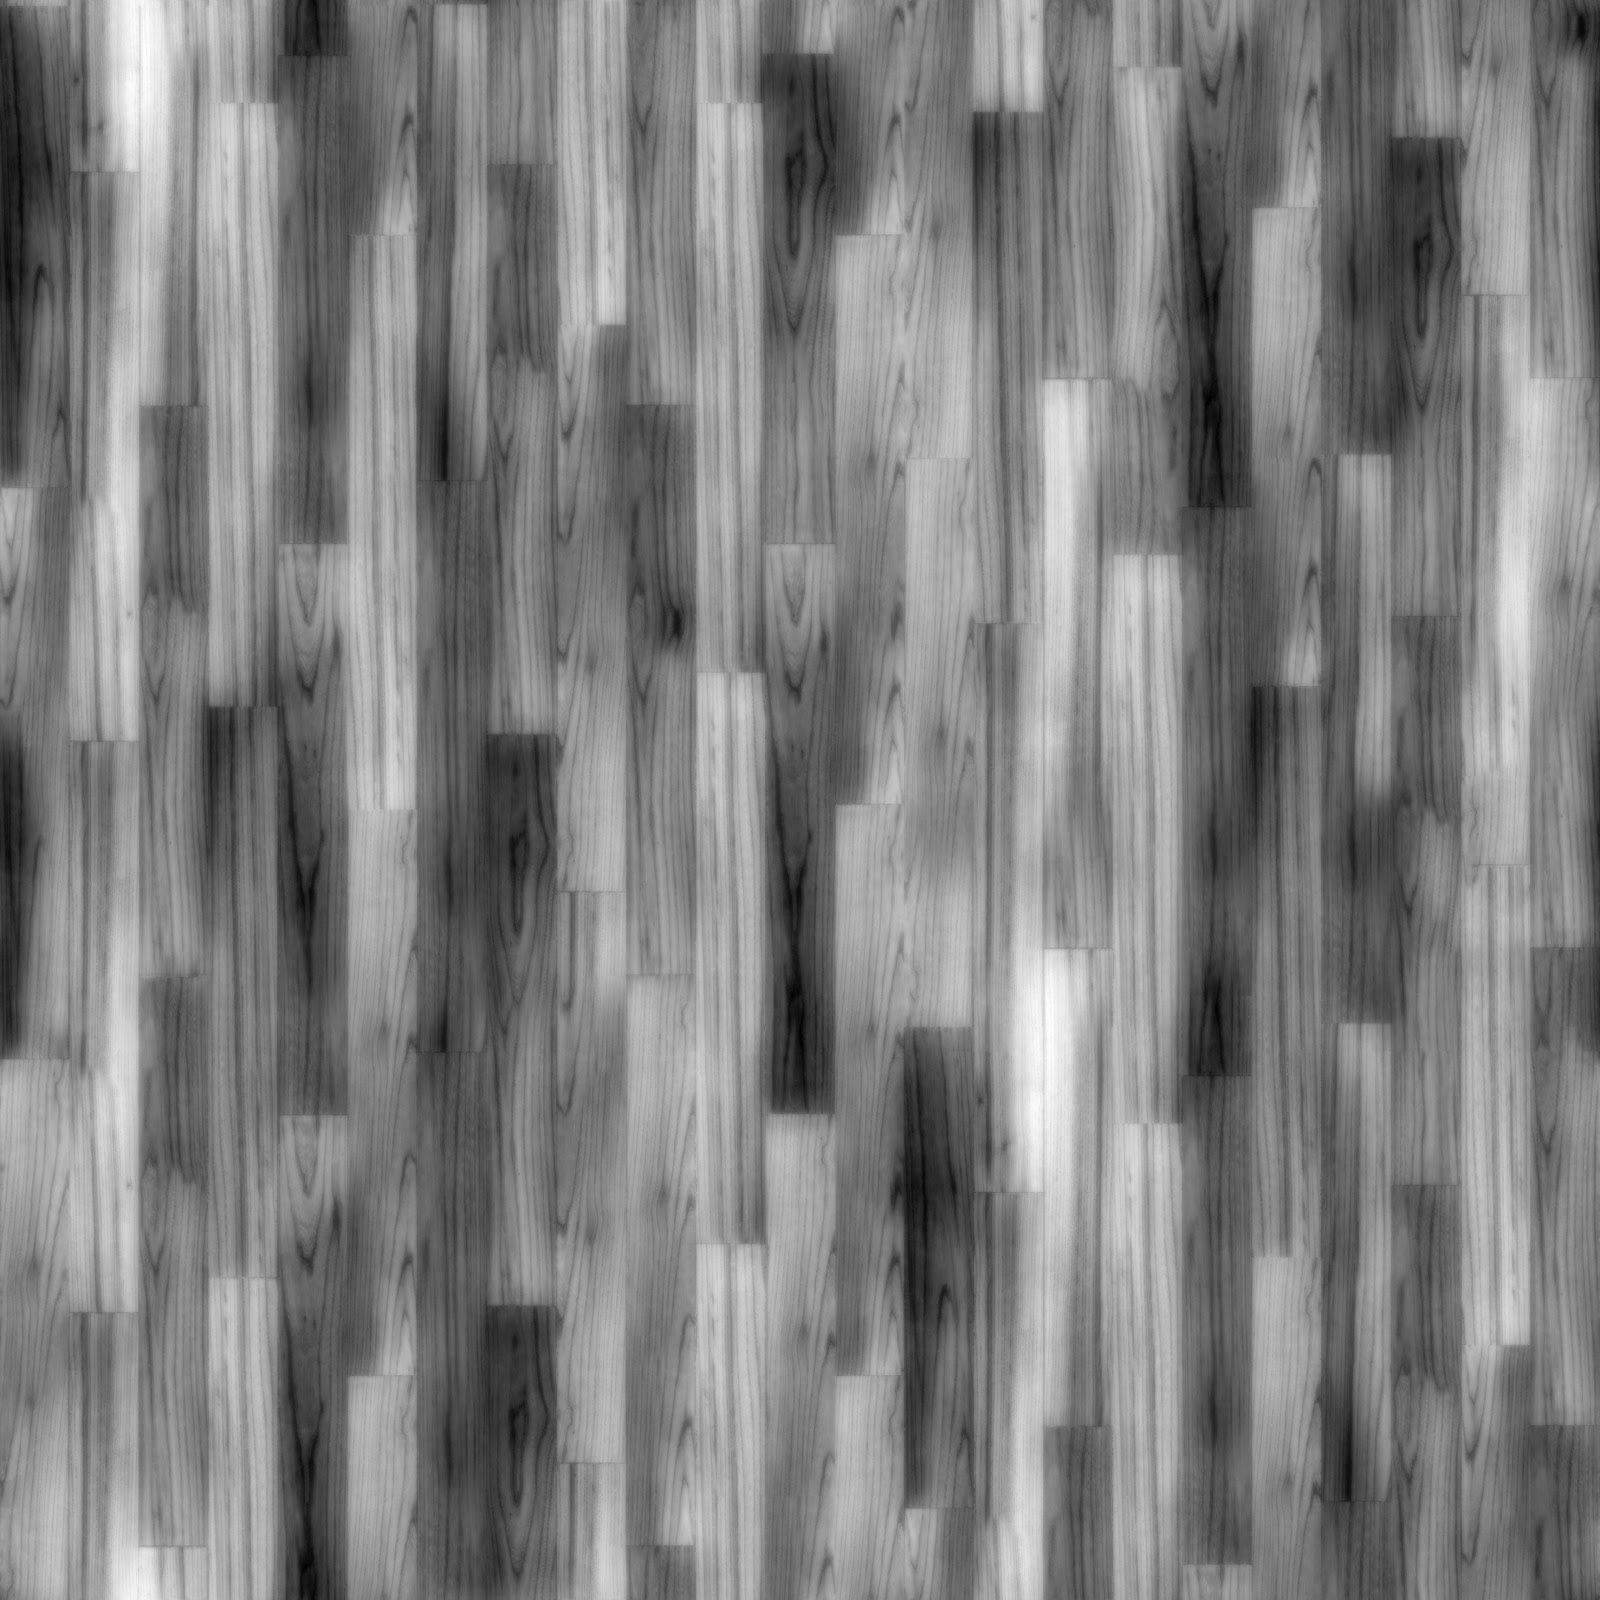 Rovere Wood Parquet Maps Texturise Free Seamless